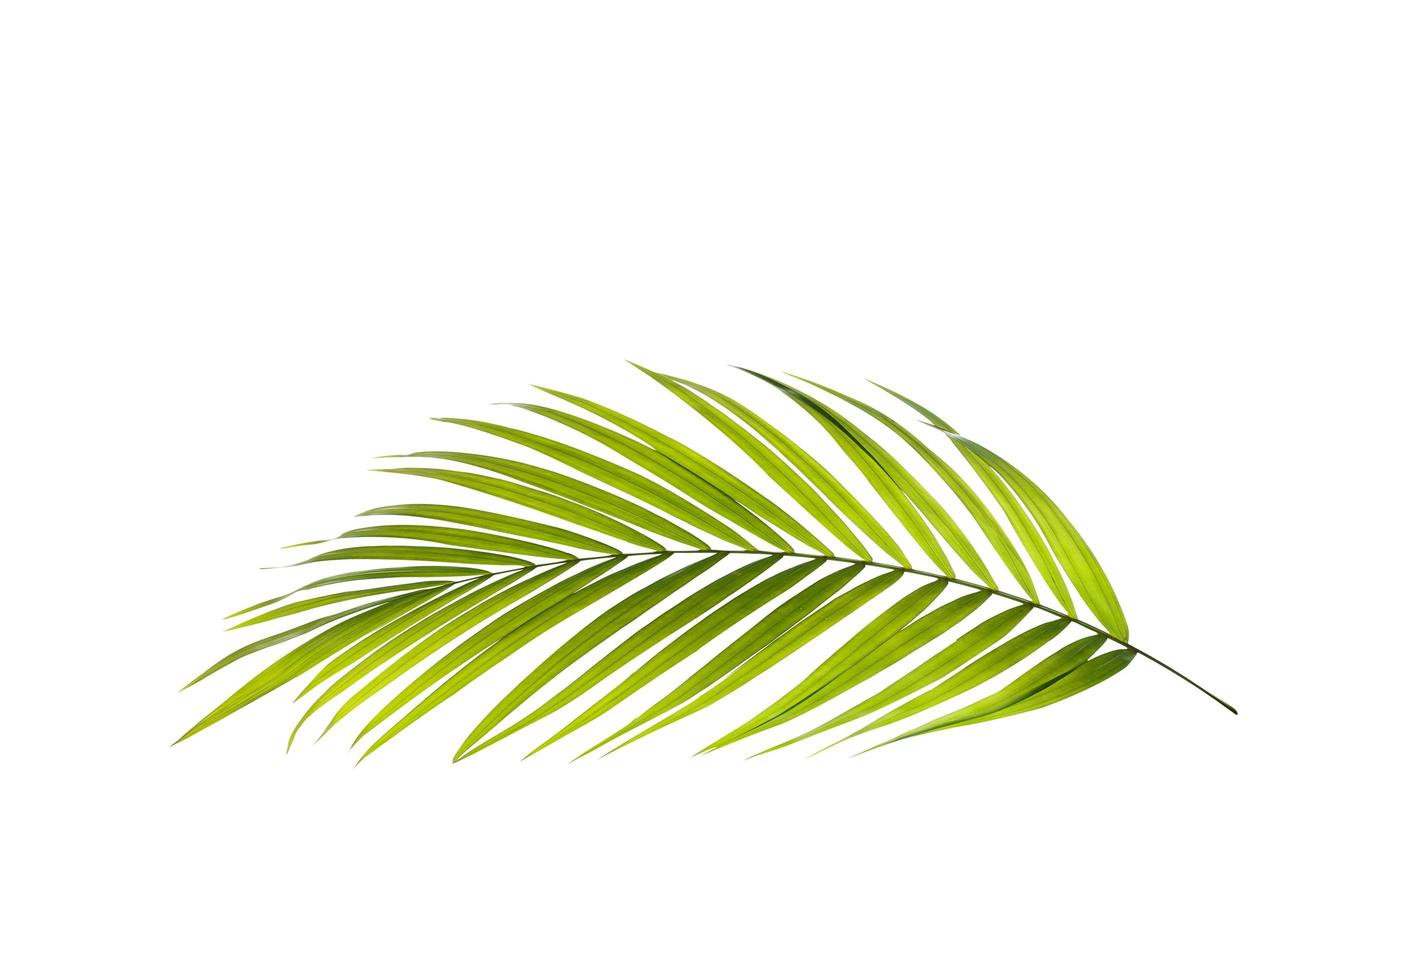 rama de palmera verde vibrante foto